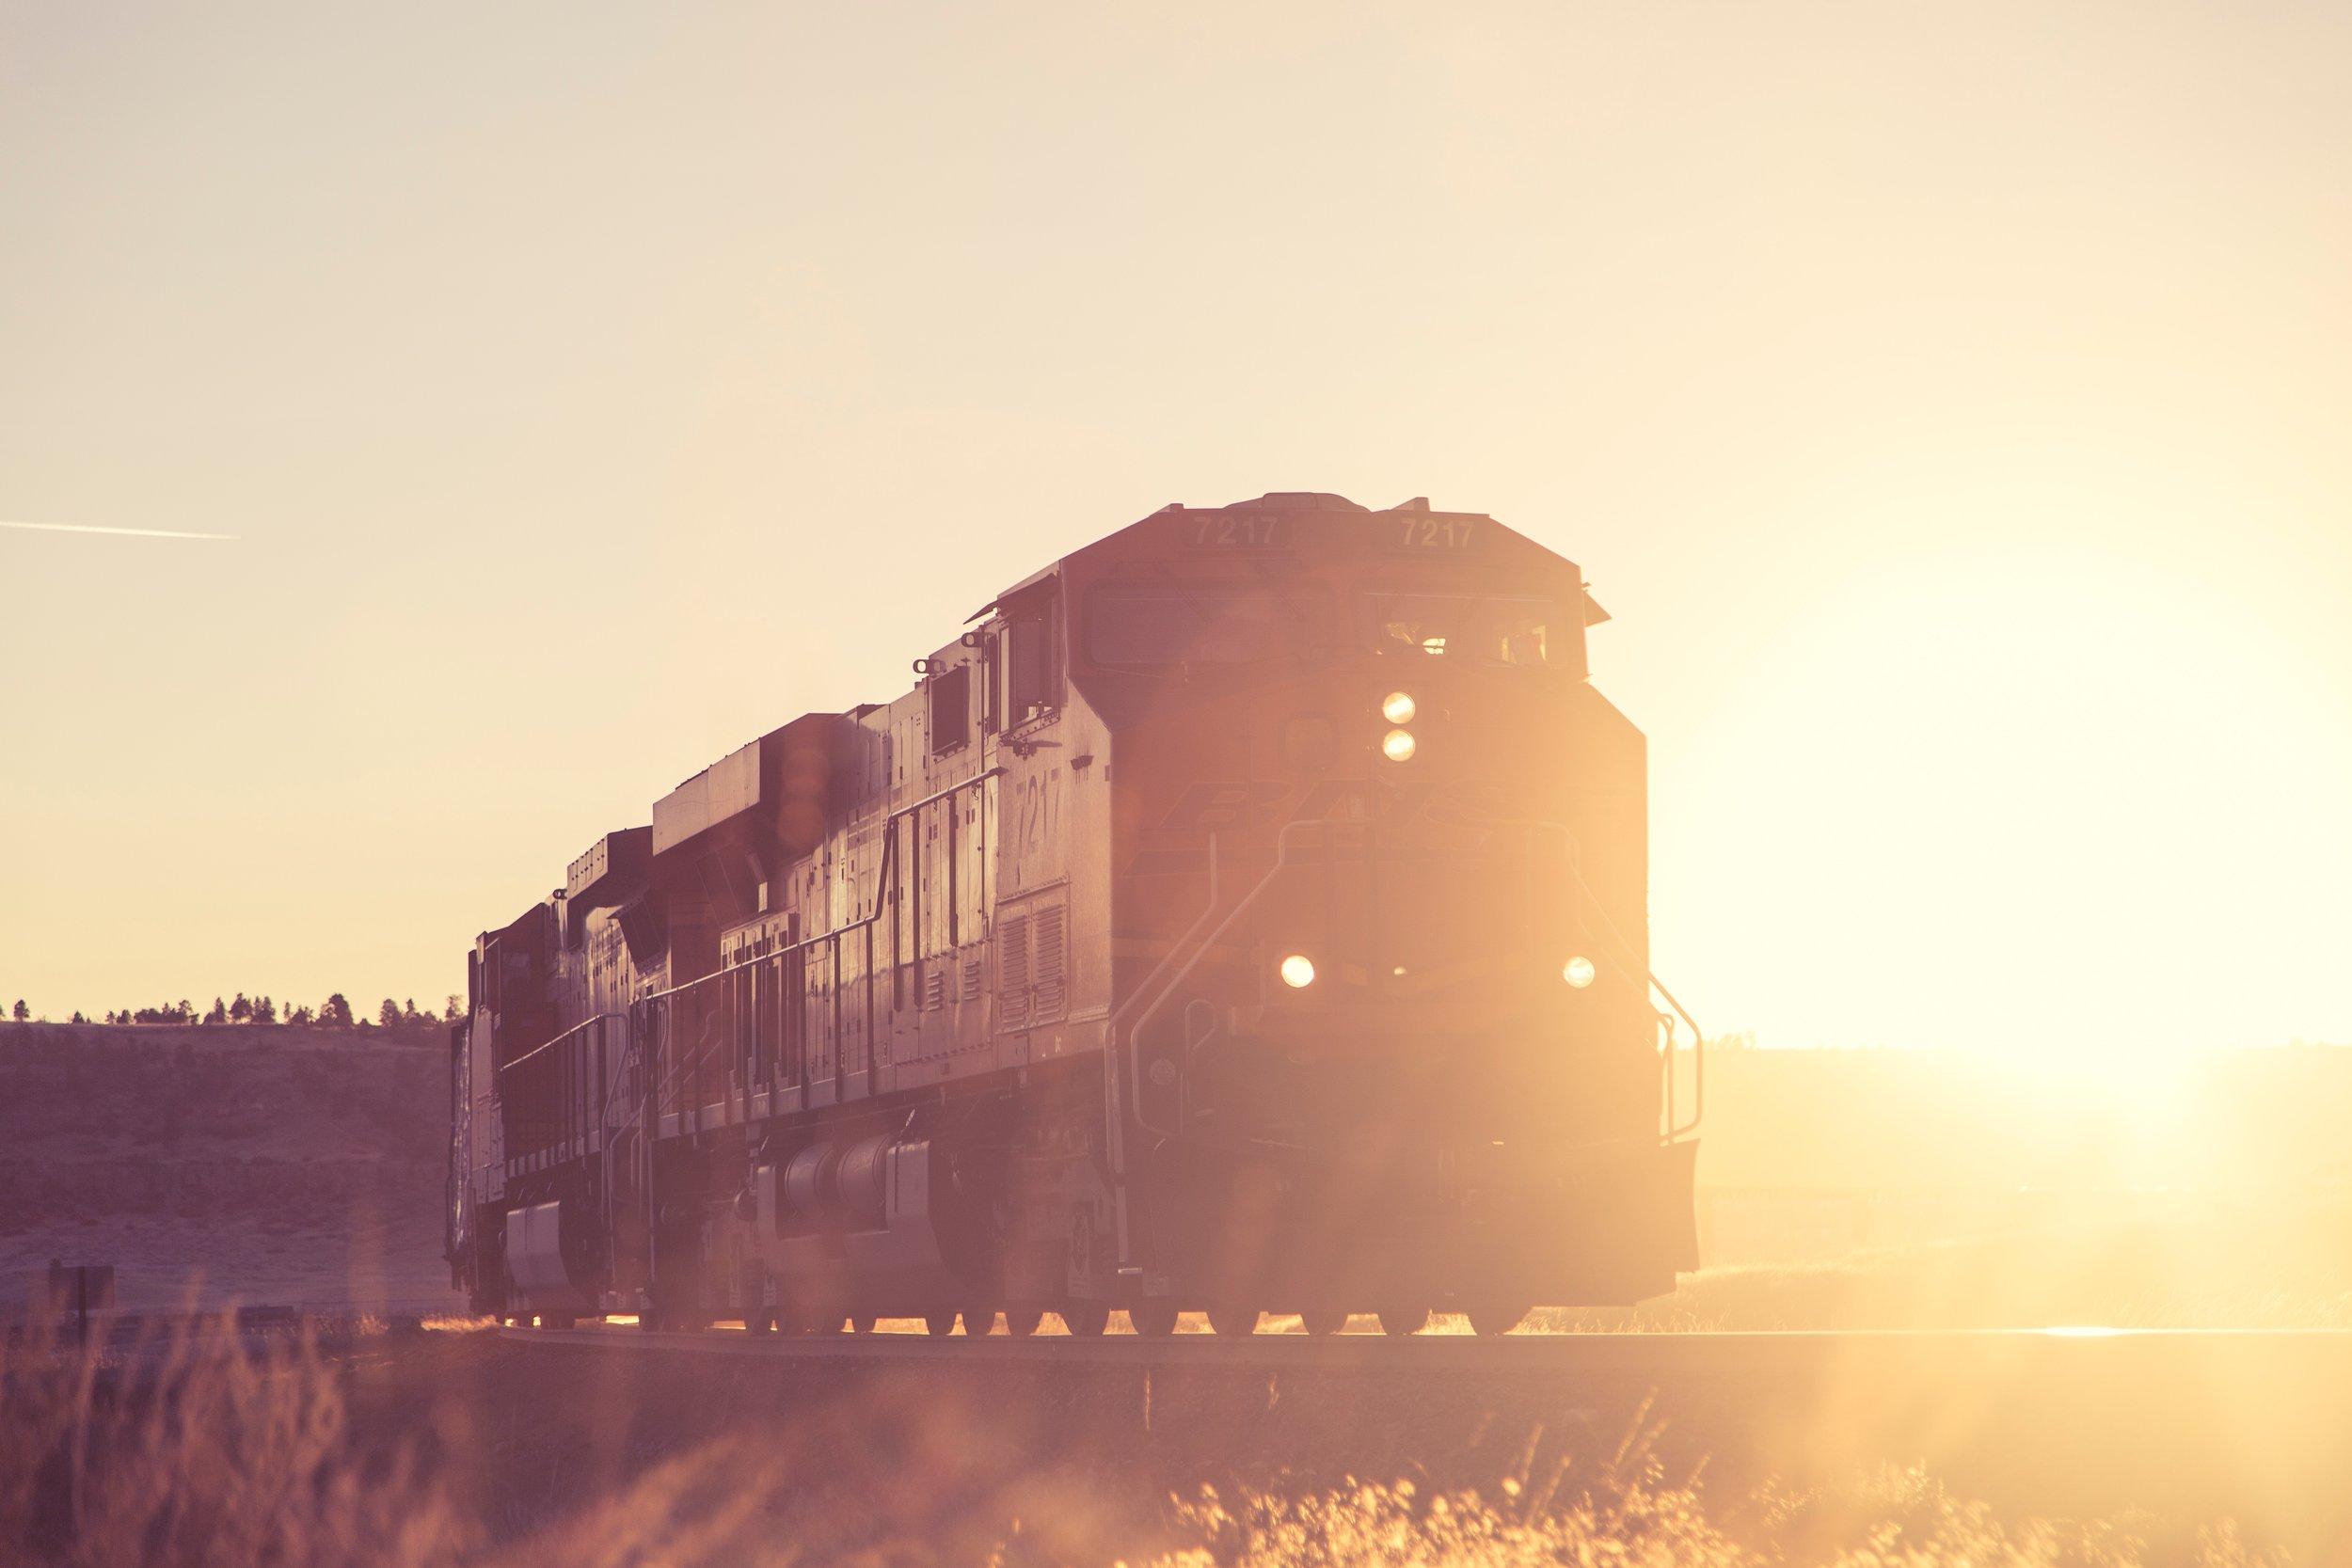 trainsunset.jpg